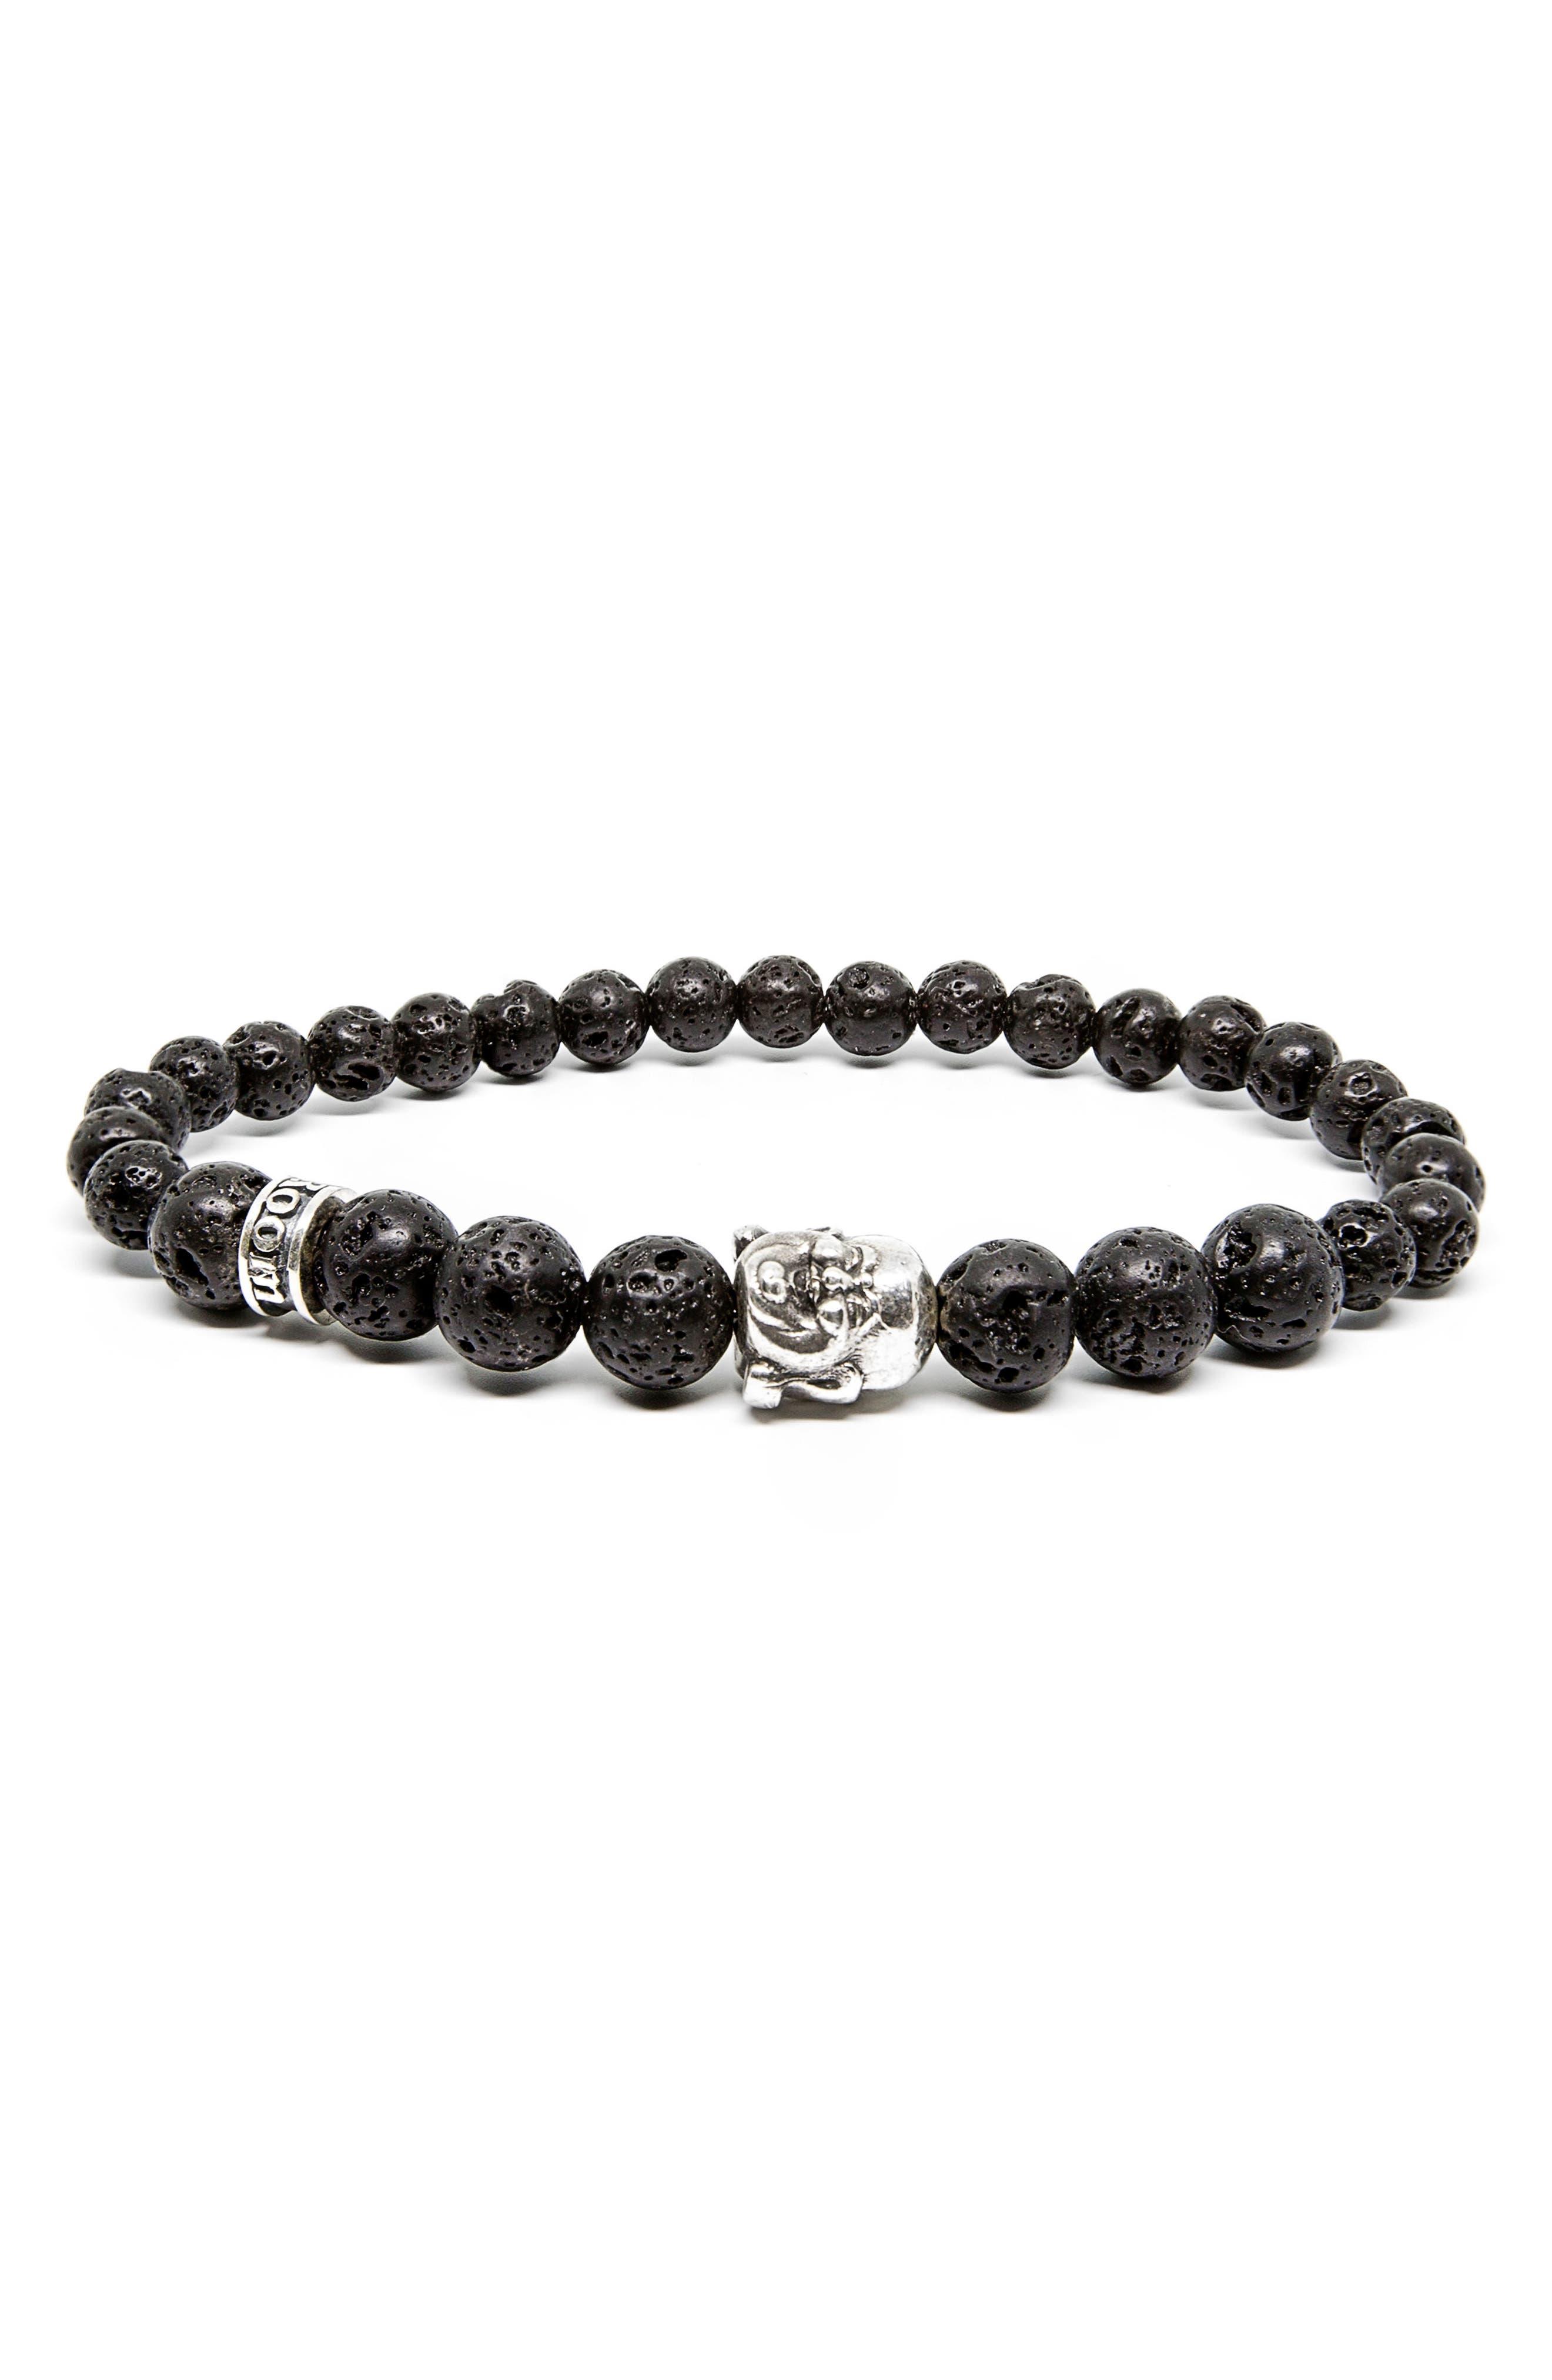 Alternate Image 1 Selected - Room101 Lava Stone Buddha Bracelet